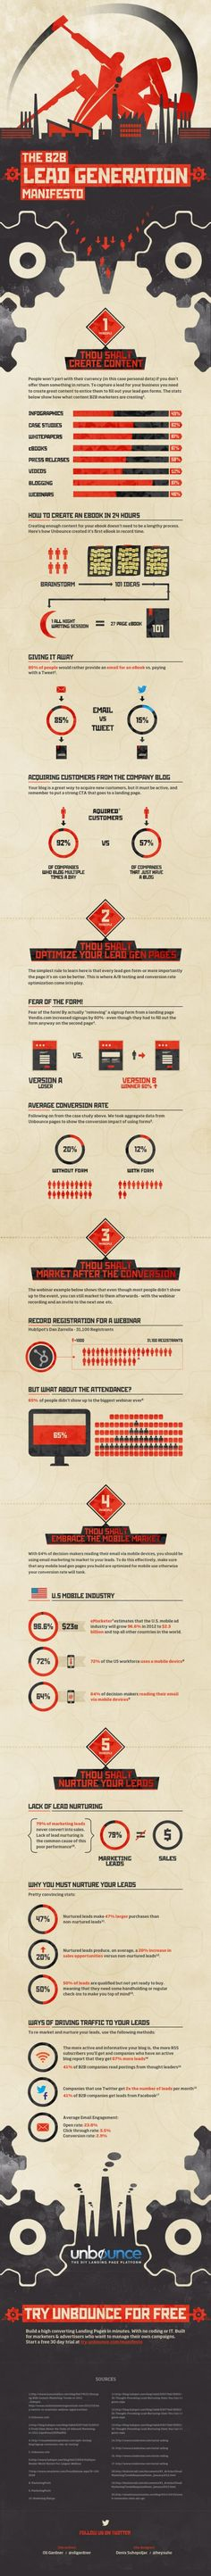 B2B Lead Generation Manifesto #infographic